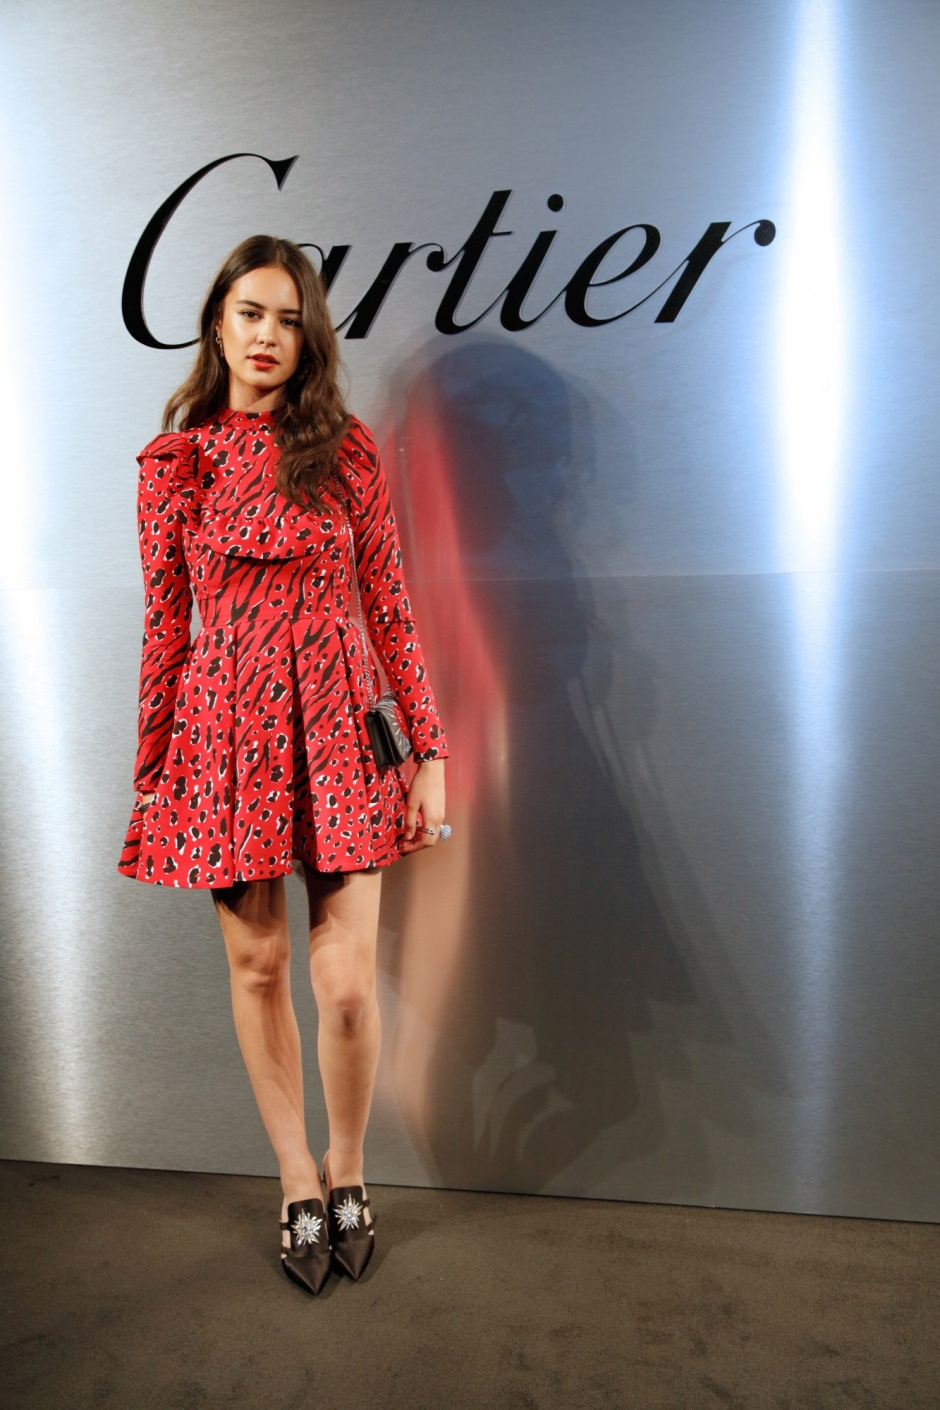 Cartier Celebrates The Launch Of Santos de Cartier Watch - Photocall